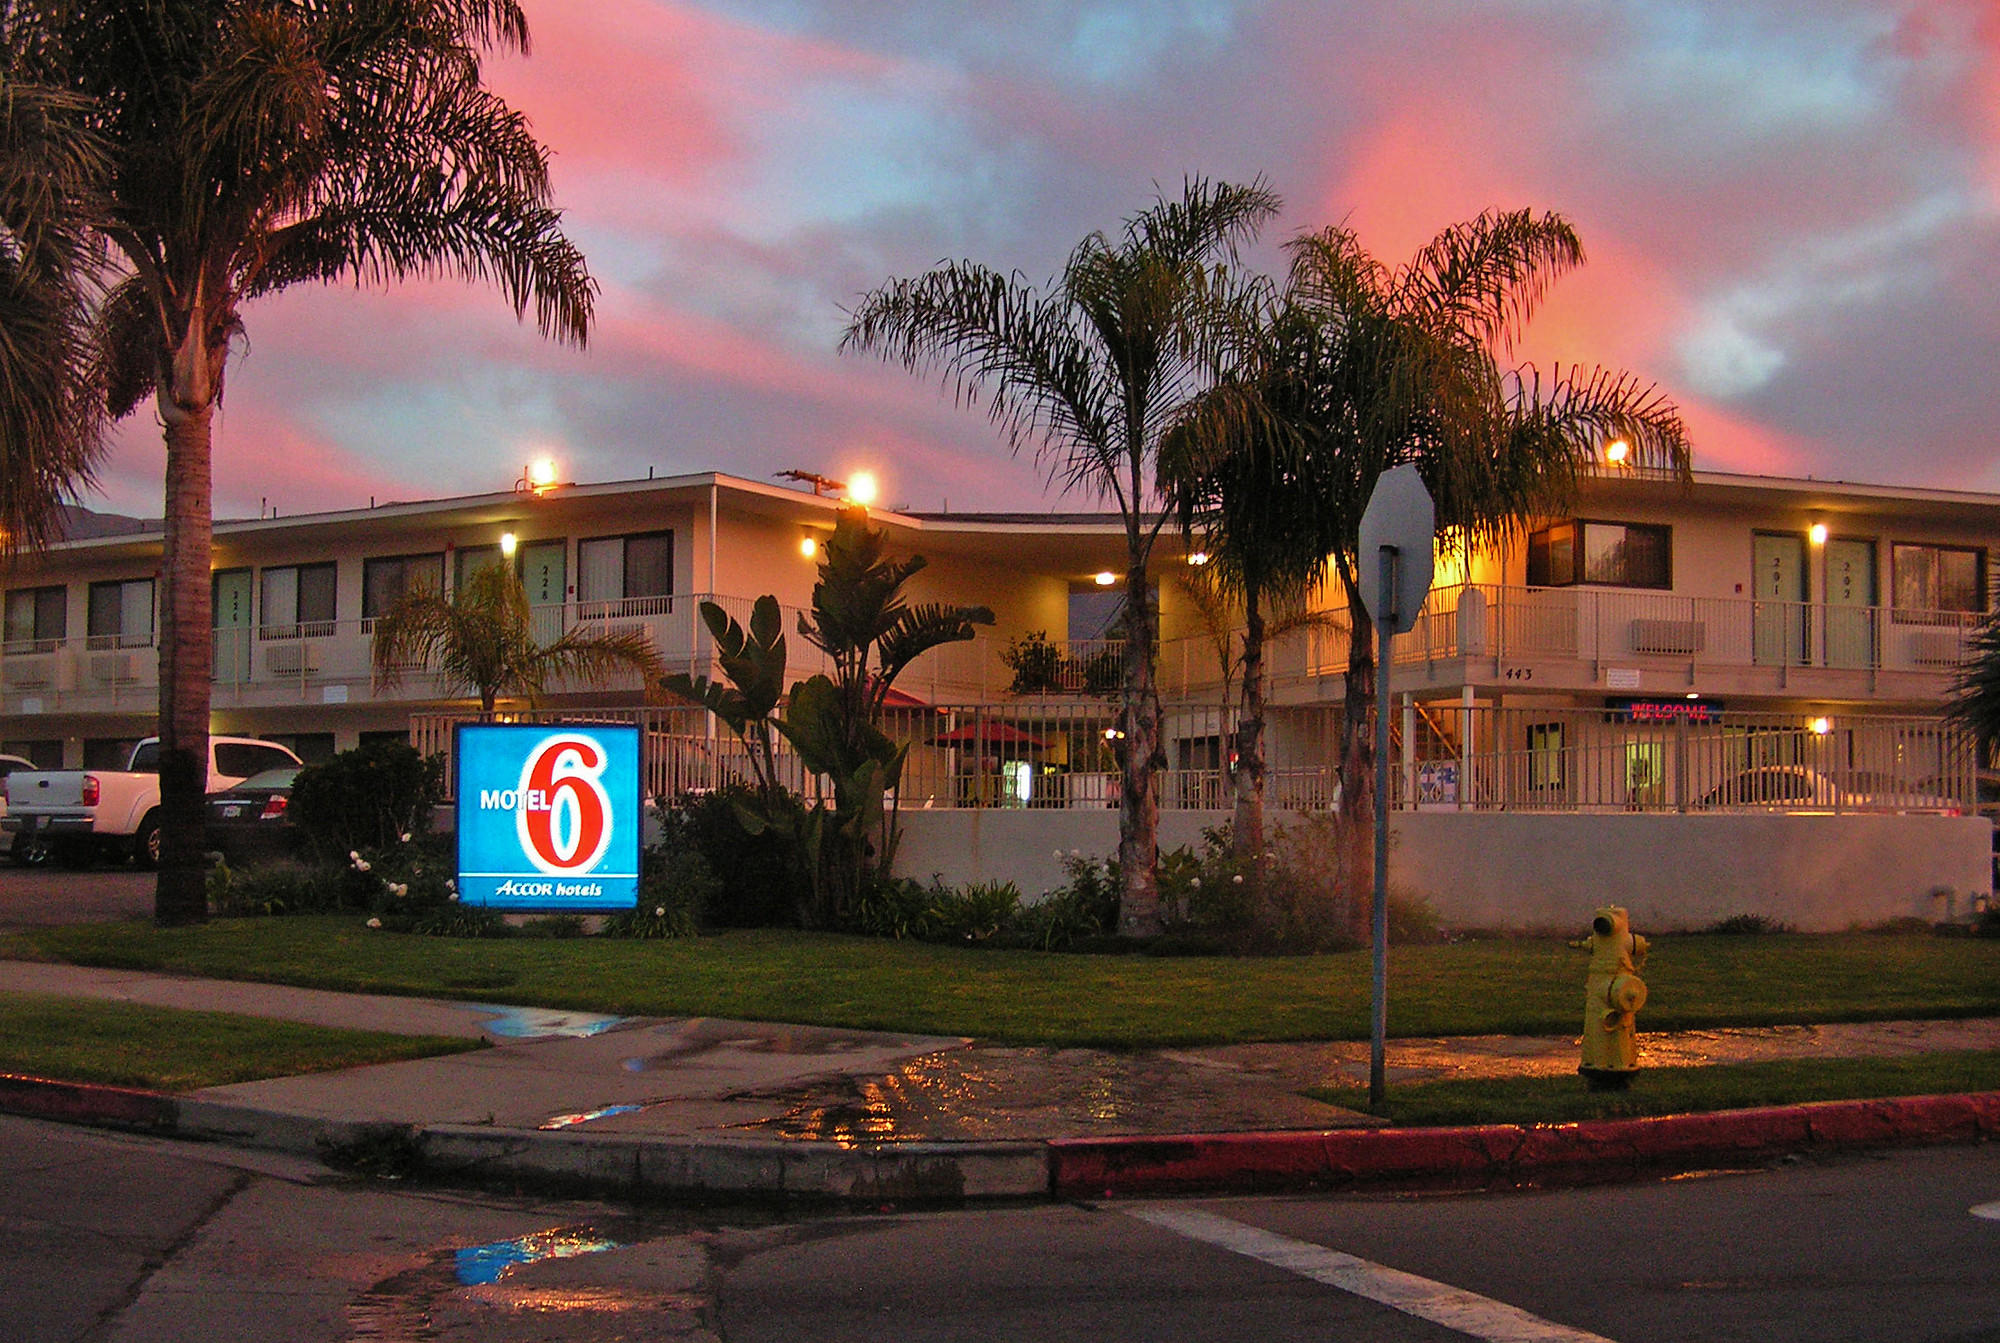 Top Super Bowl Radio Ads Motel 6 Turns Lights On Latimes